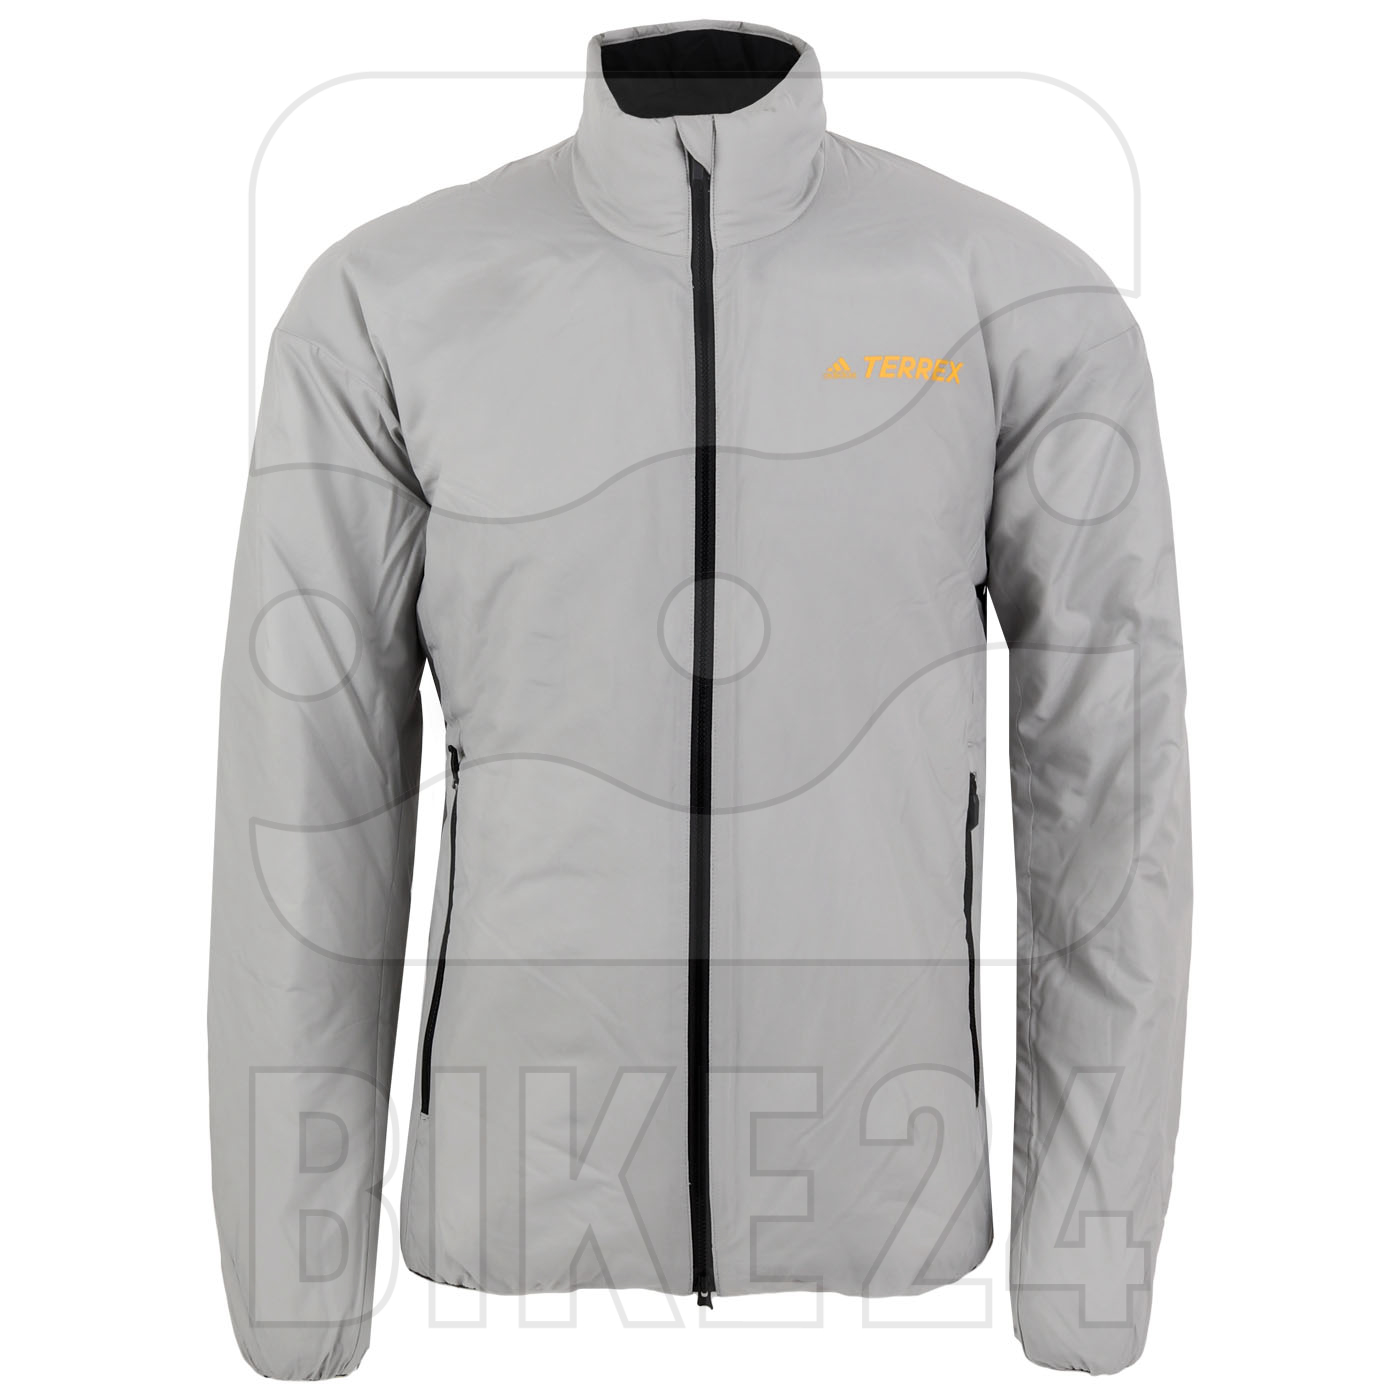 adidas Men's TERREX Insulation Jacket - metal grey GD1145